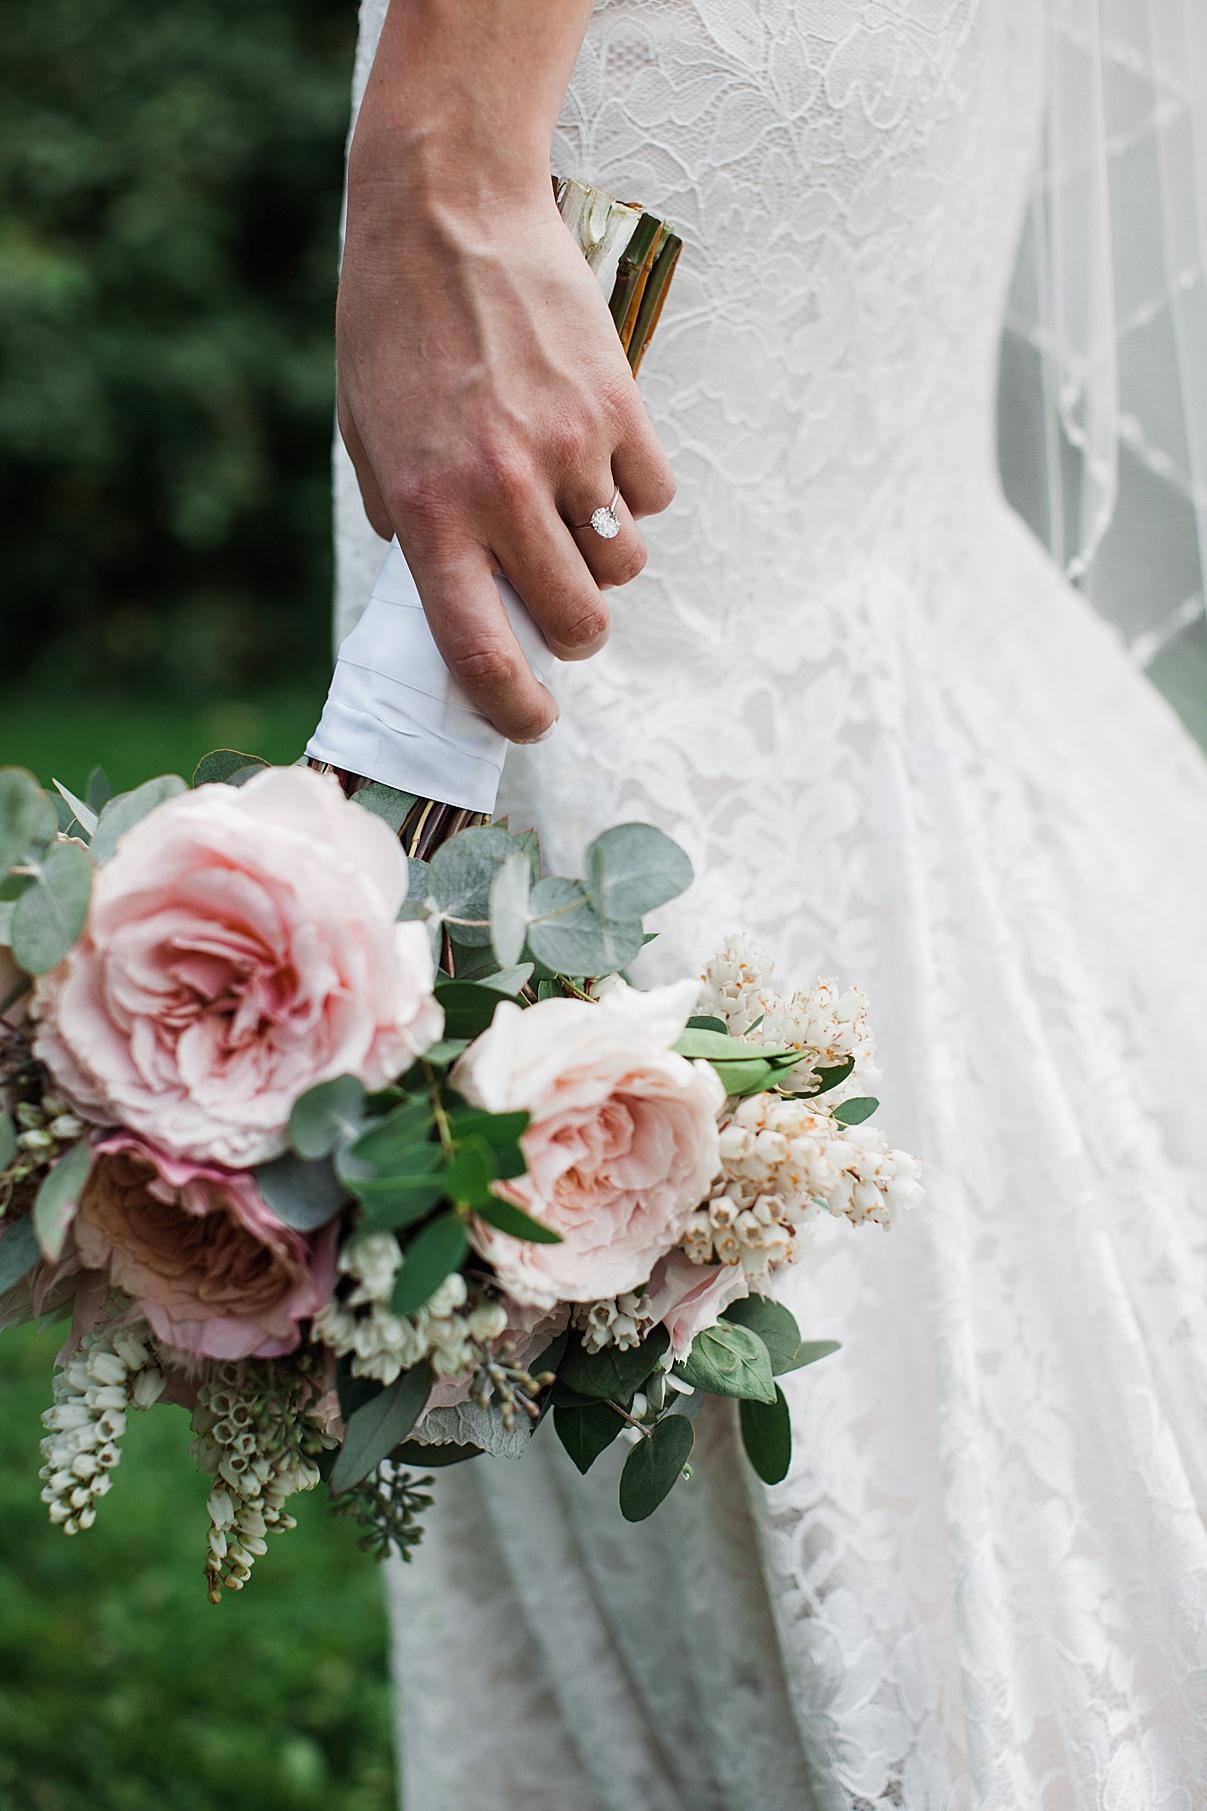 Bride holding gorgeous bridal bouquet down by train of dress| Harding Waterfront Estate Wedding| Ontario wedding photographer| Toronto wedding photographer| 3 Photography | 3photography.ca